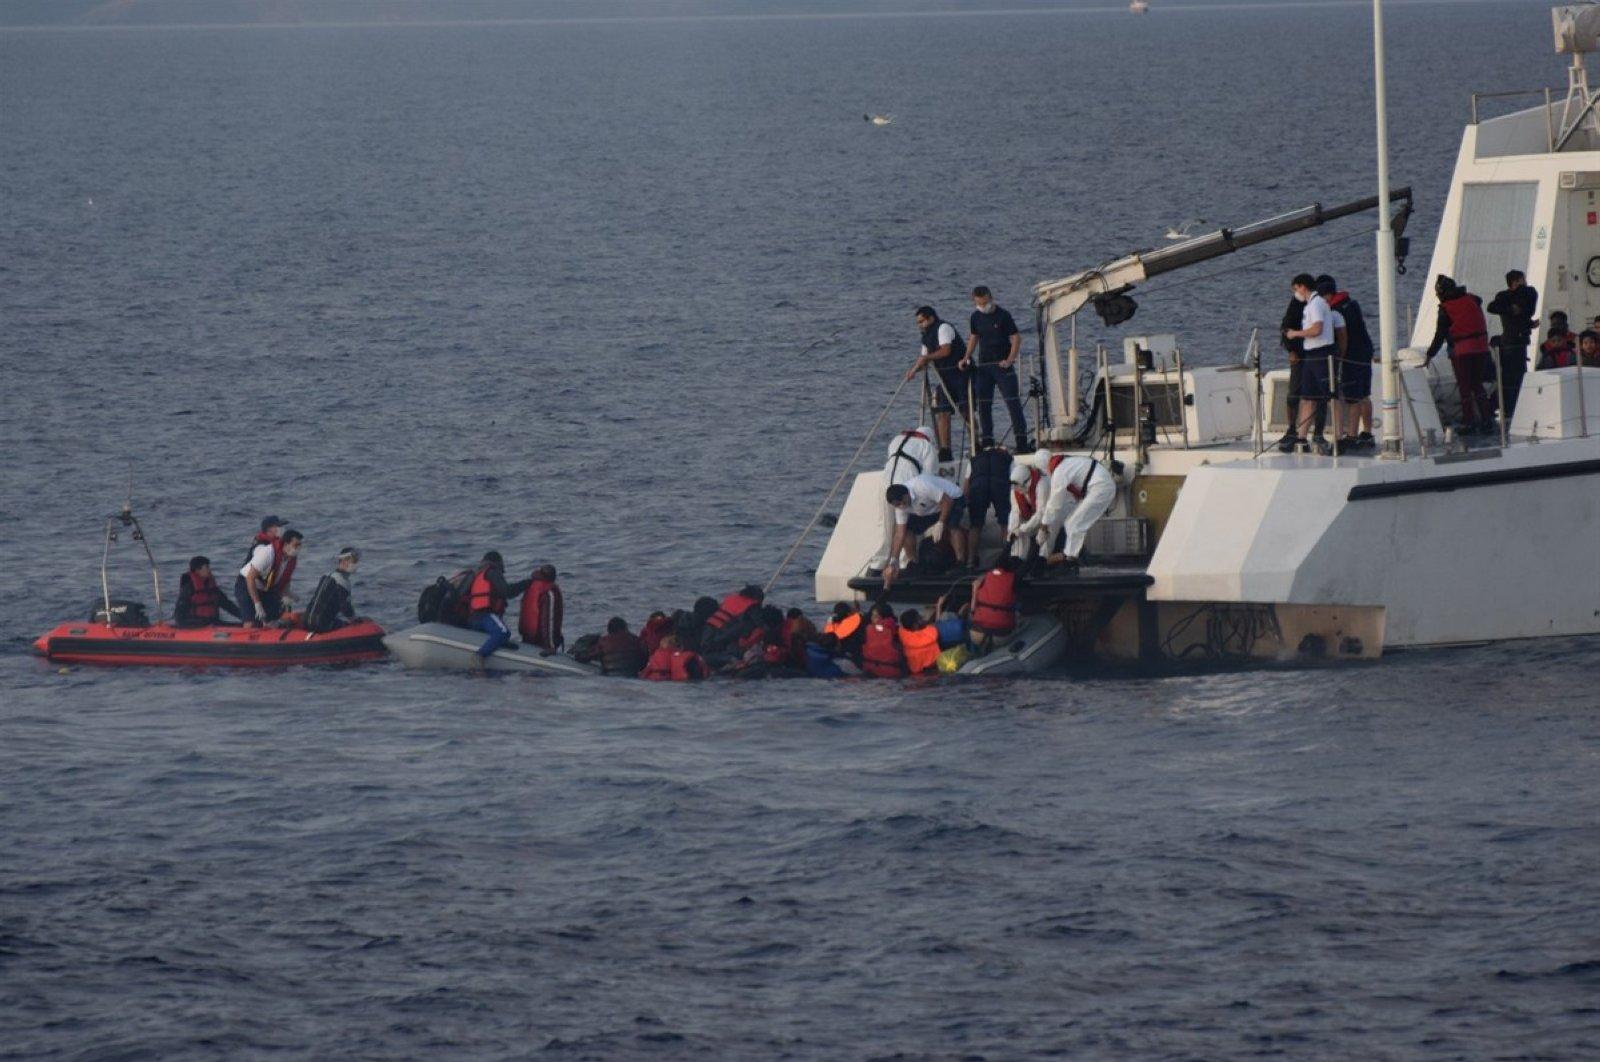 Turkish coast guard rescues asylum-seekers pushed back by Greece near western Çanakkale province in the Aegean Sea, June 13, 2020. (DHA)